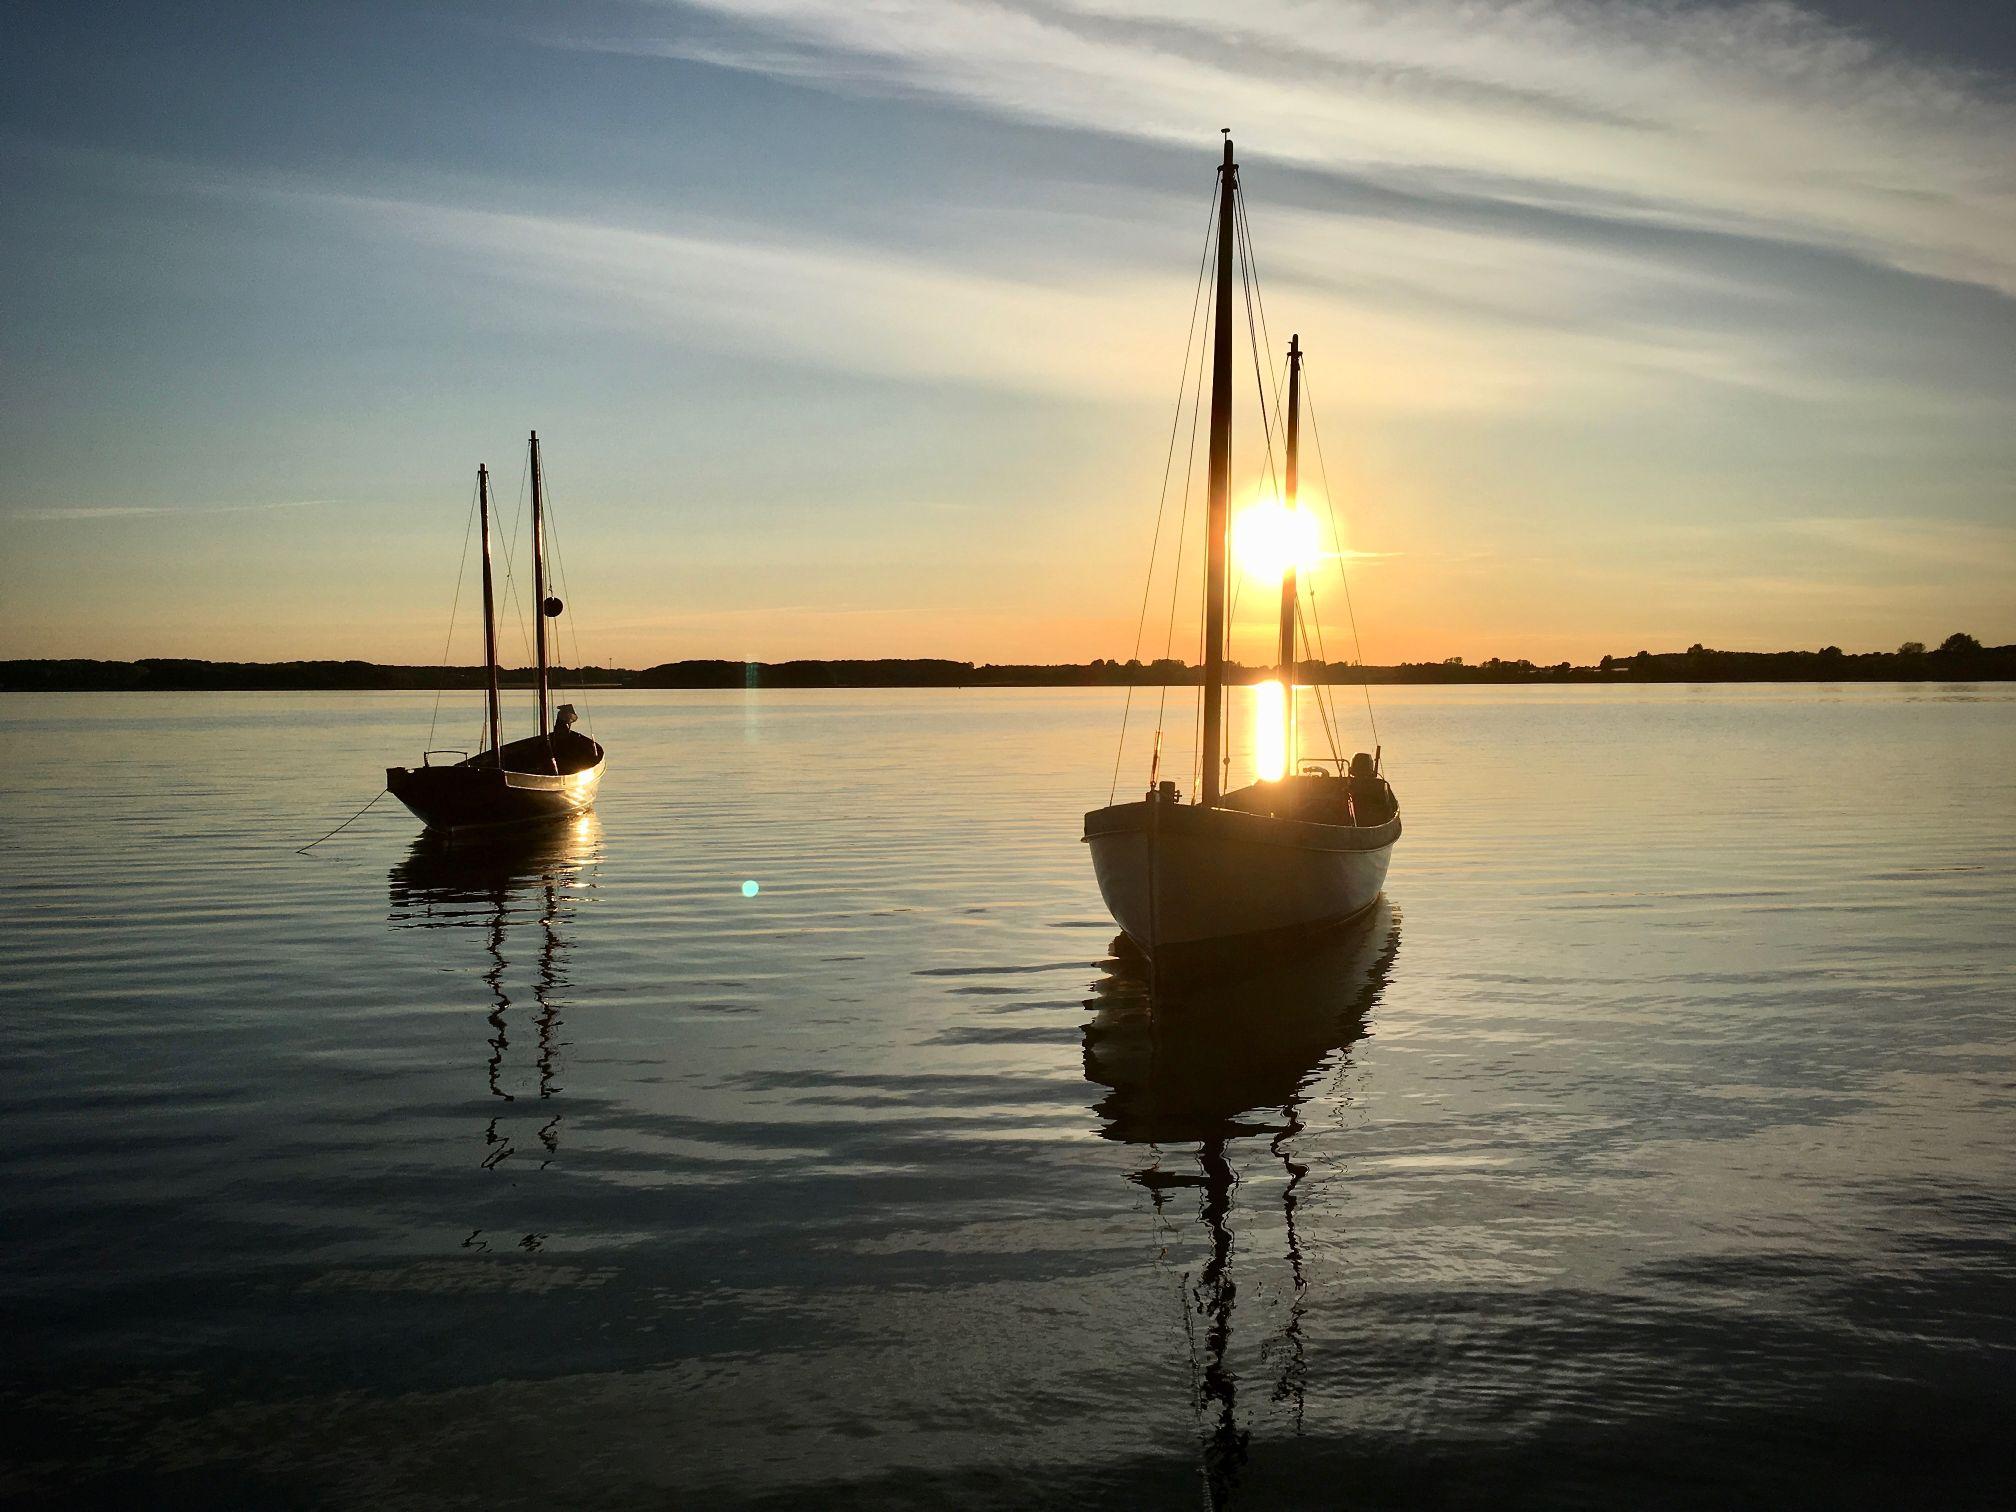 Wache bei Sonnenuntergang